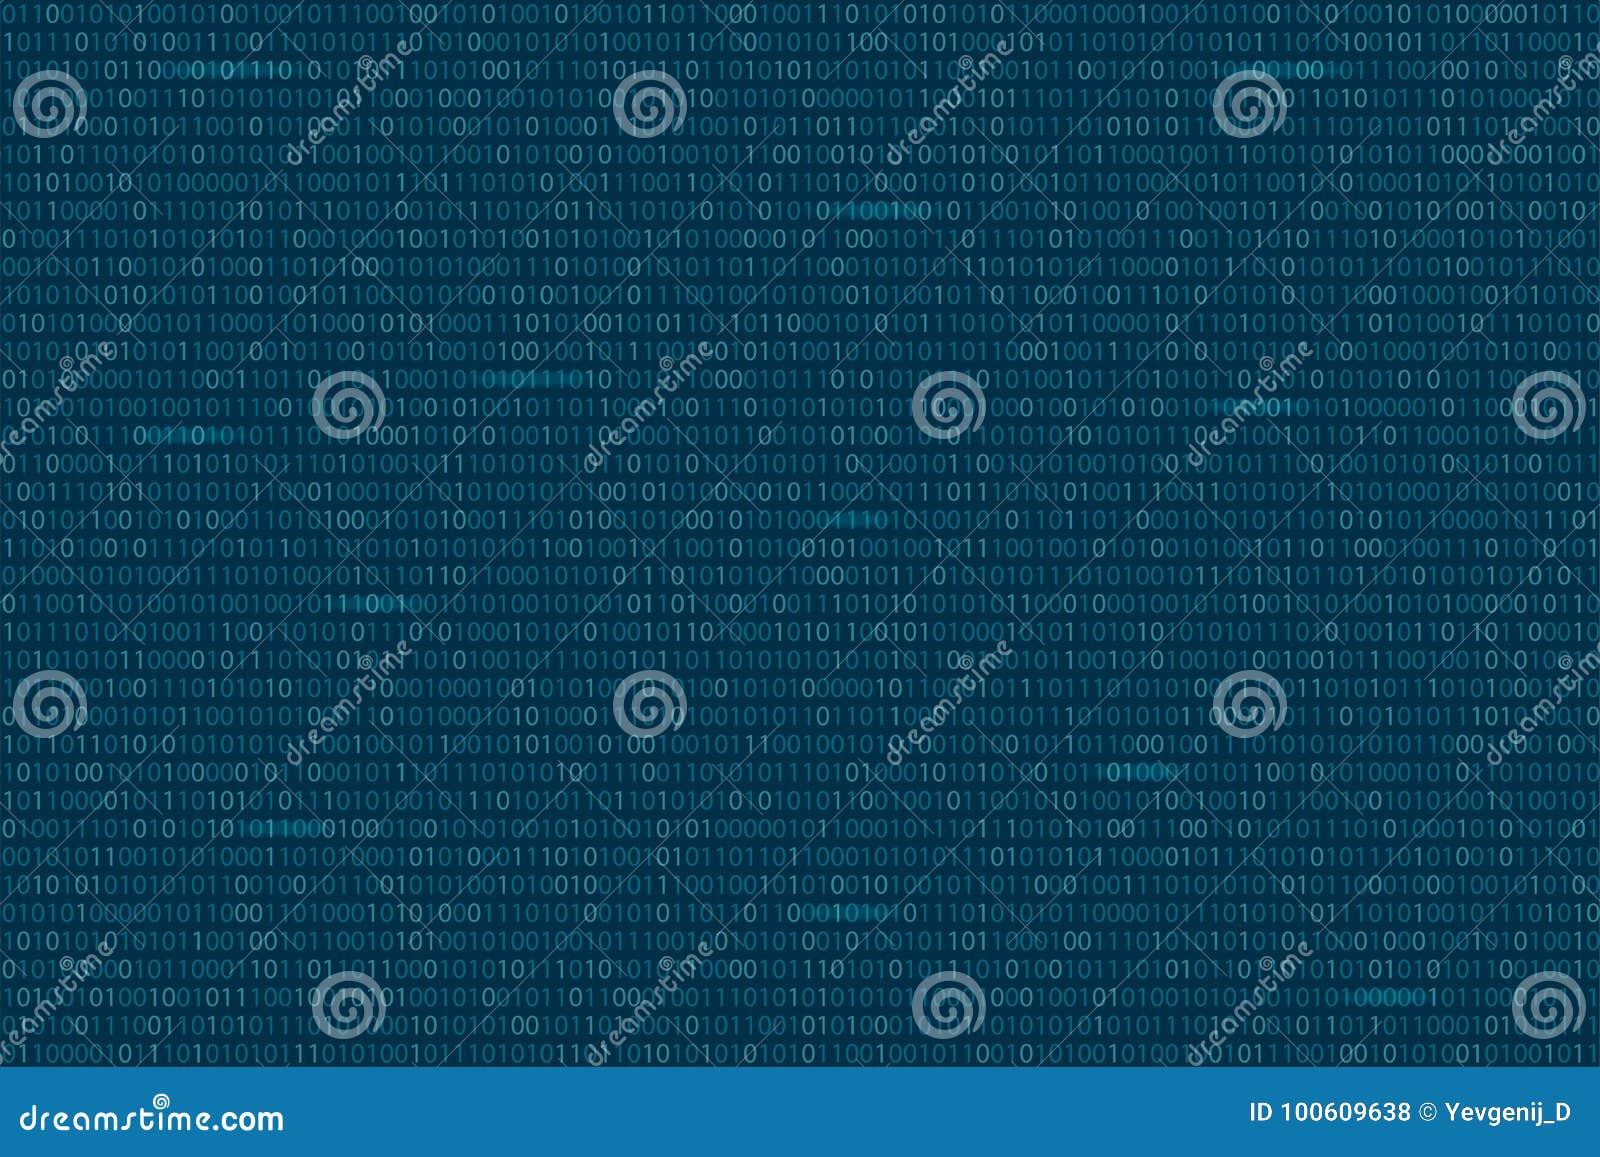 Abstract Binary Code Background Digital Technology Wallpaper Password Blue